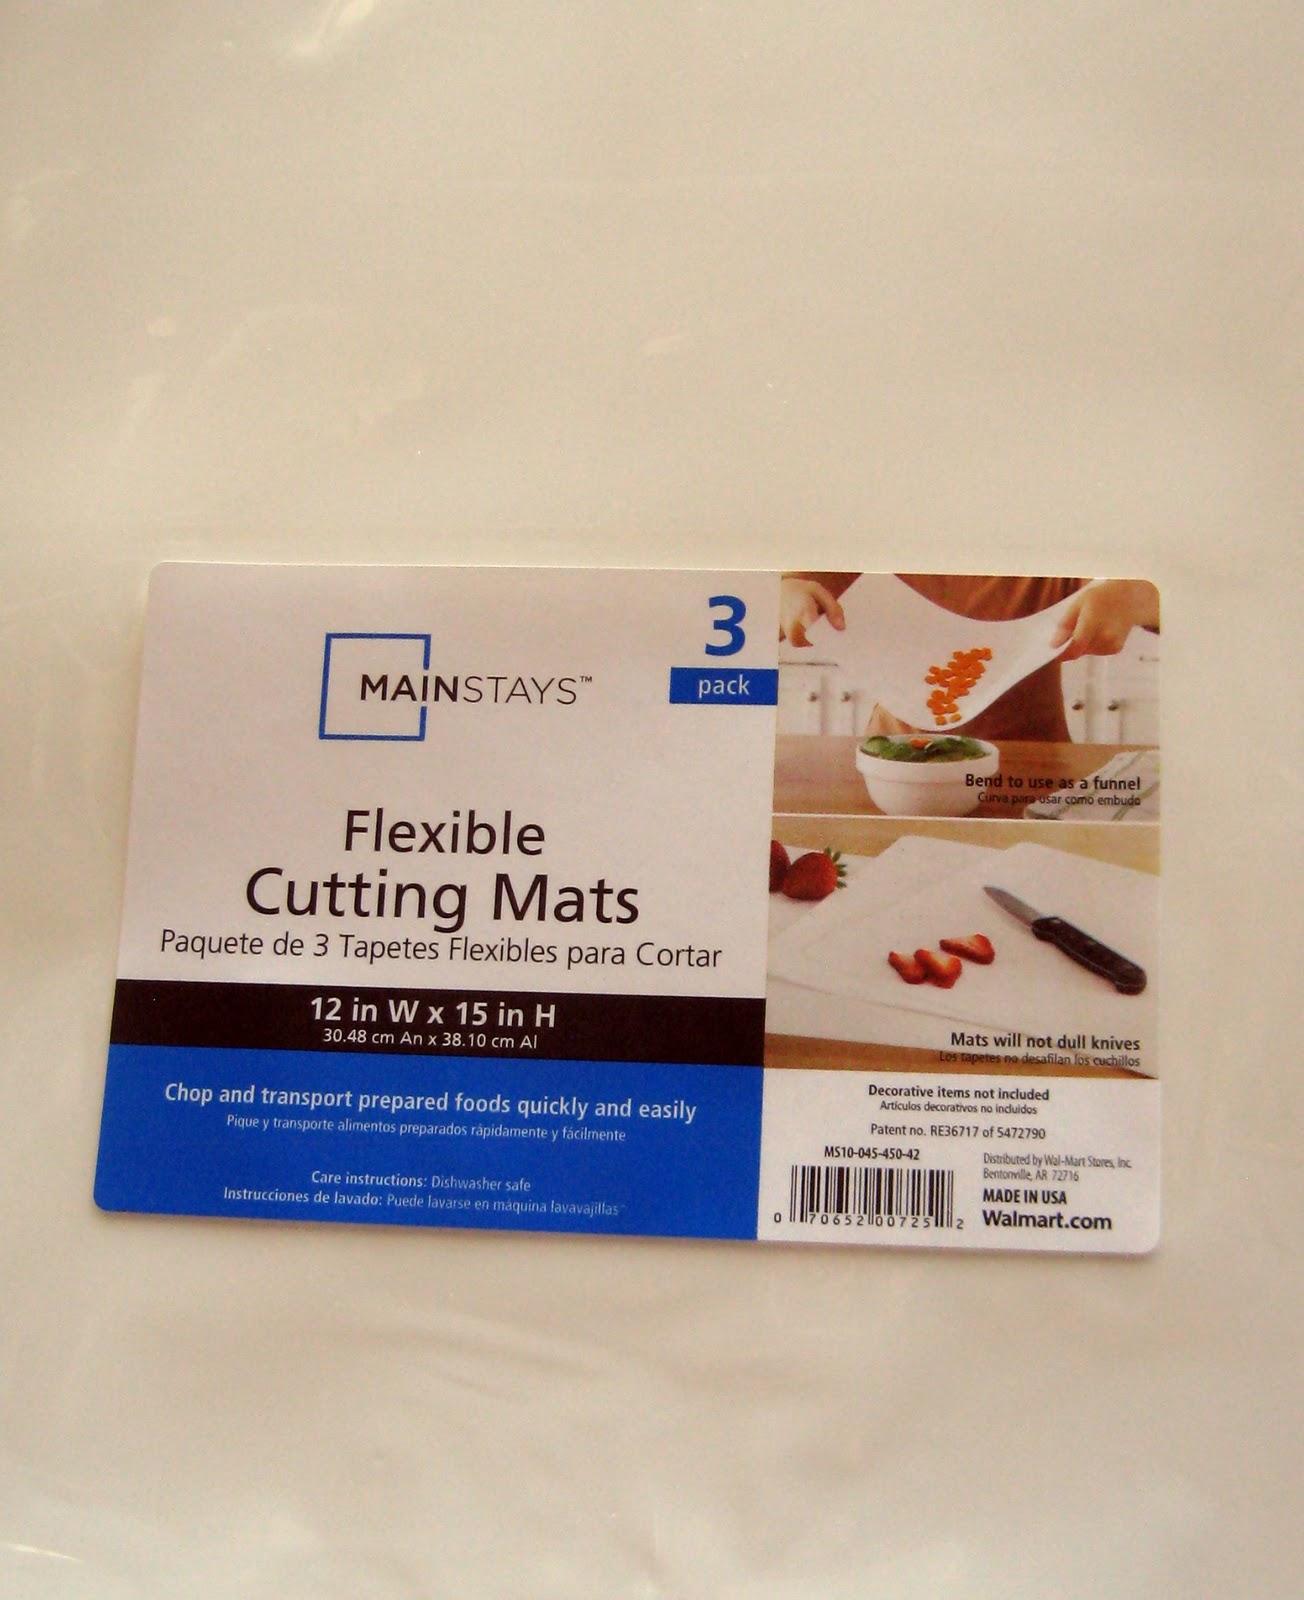 http://1.bp.blogspot.com/_TtPd7zCPwuk/TUtLL0pE3qI/AAAAAAAAAMQ/dLuyQiJMlj8/s1600/Cutting+mats.jpg